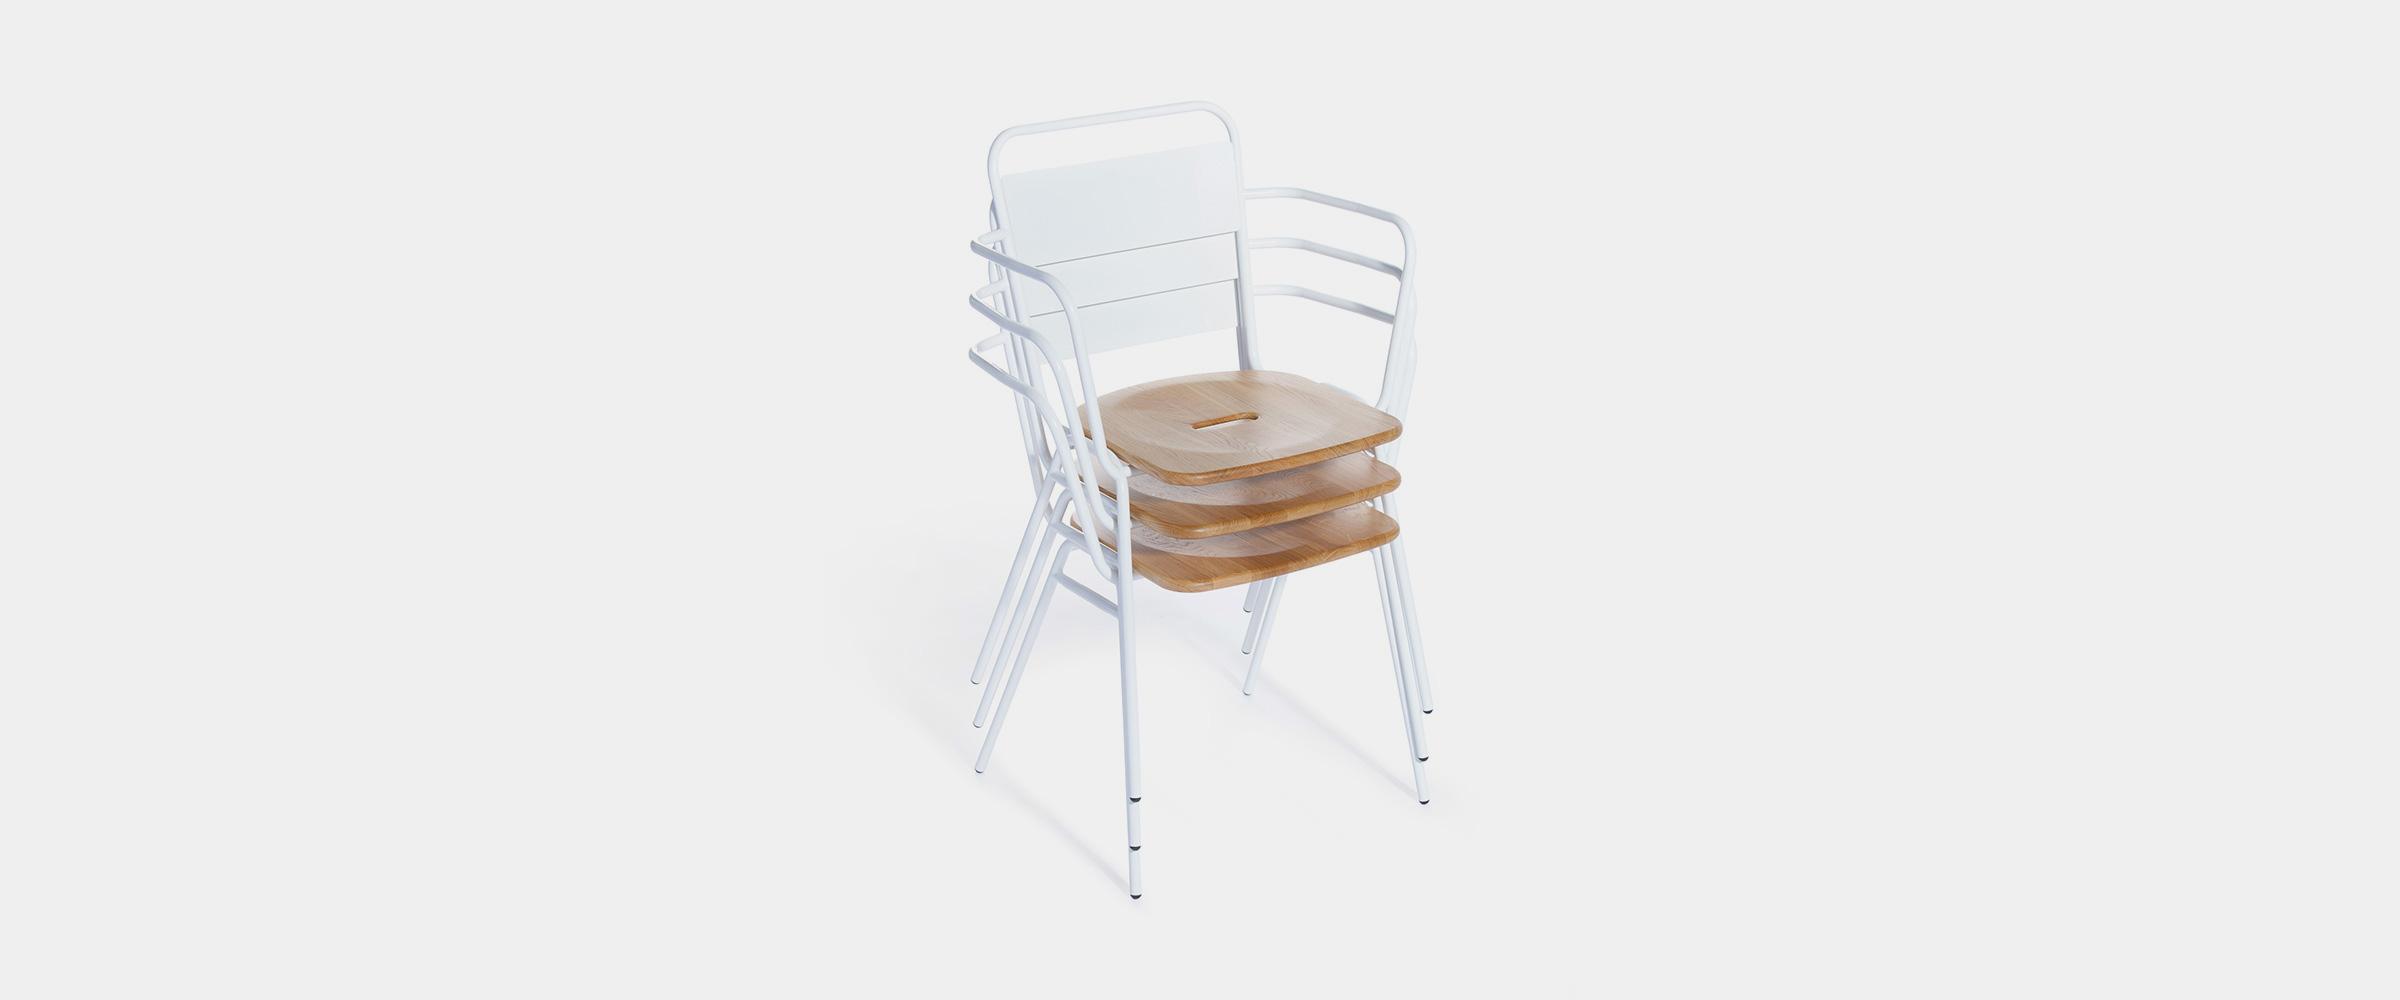 Working-Girl-Arm-Chair-3D-StackedB.jpg